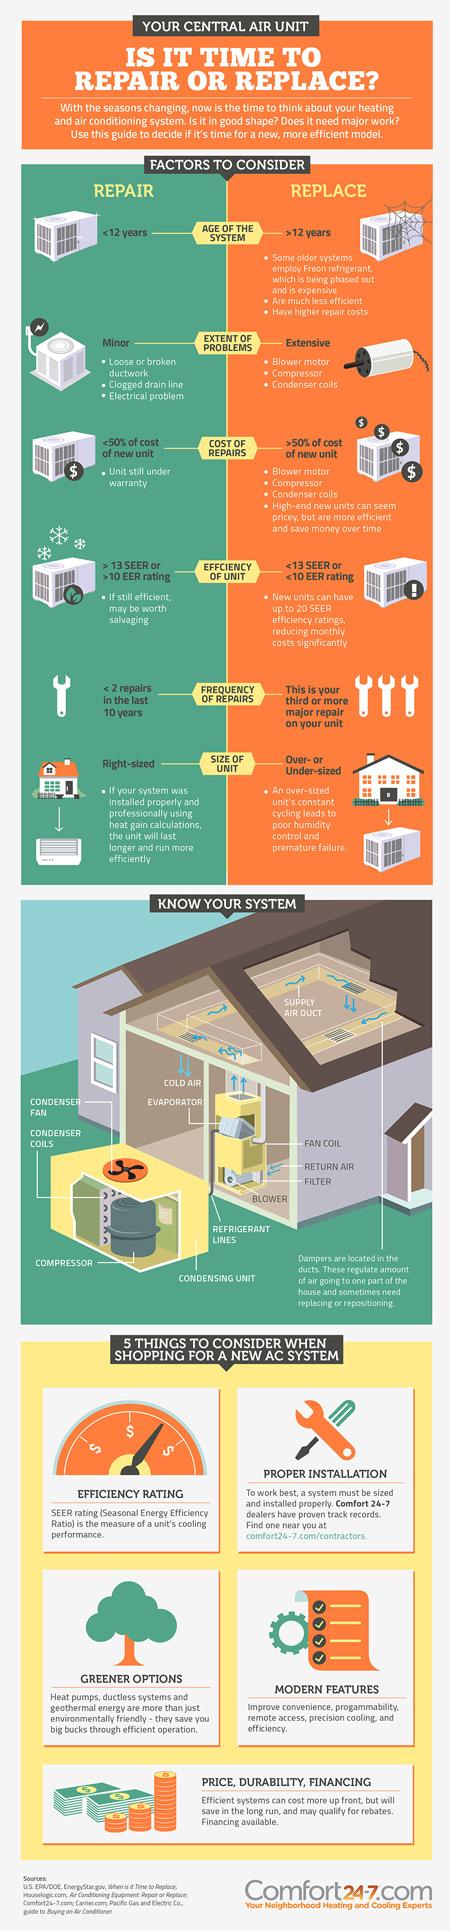 HVAC AC Repair or Replace Infographic Comfort247